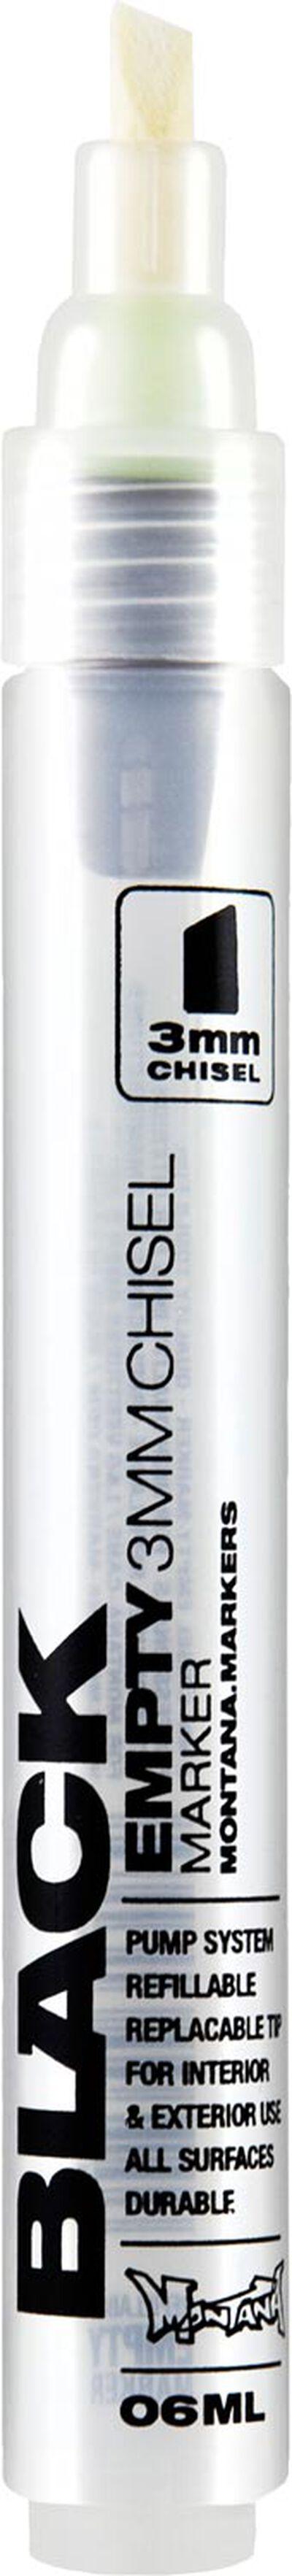 Black 3 mm Chisel